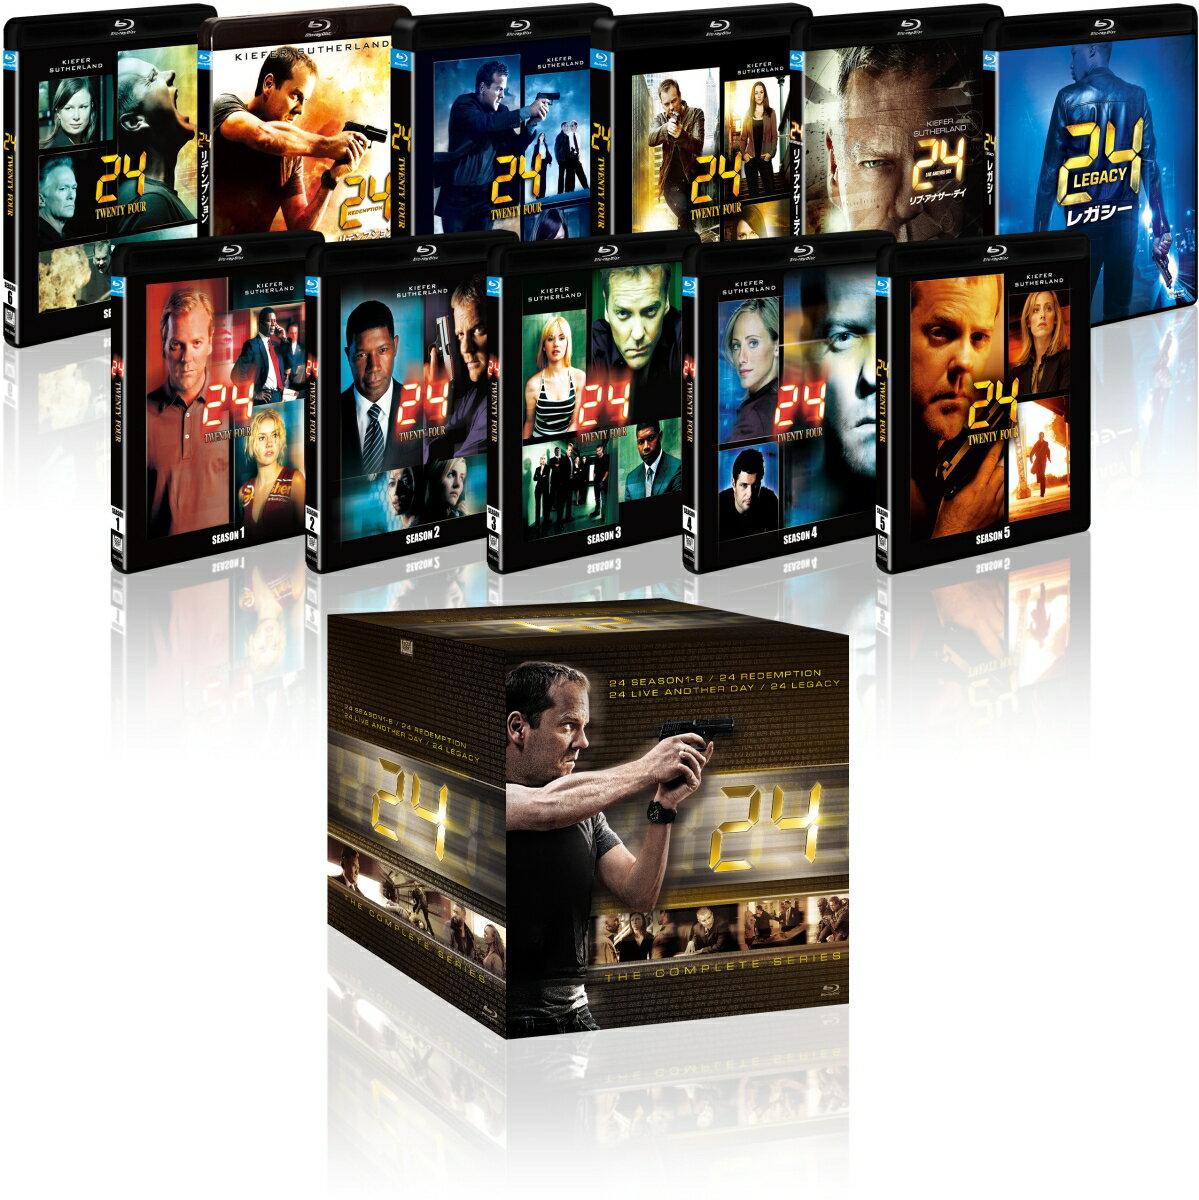 24-TWENTY FOUR- コンプリート ブルーレイBOX【Blu-ray】